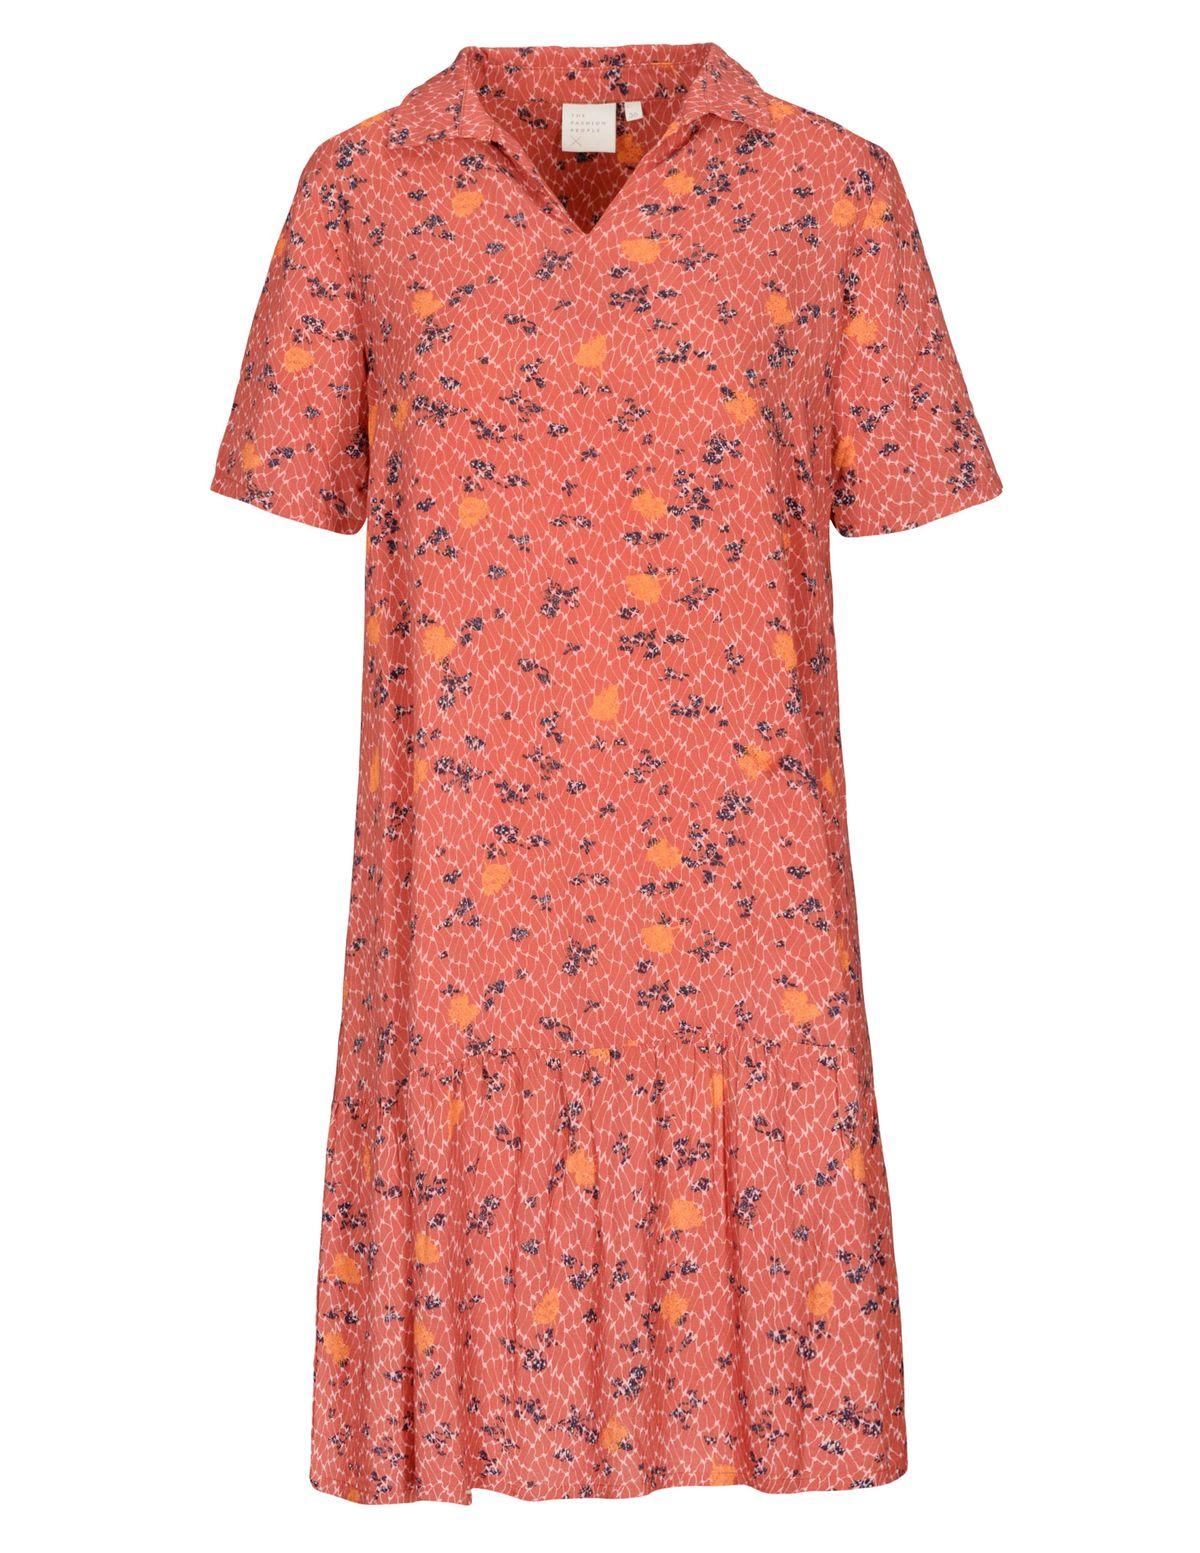 THE FASHION PEOPLE Kleid aus nachhaltigen LENZING™ ECOVERO™ Fasern - Caramel Print